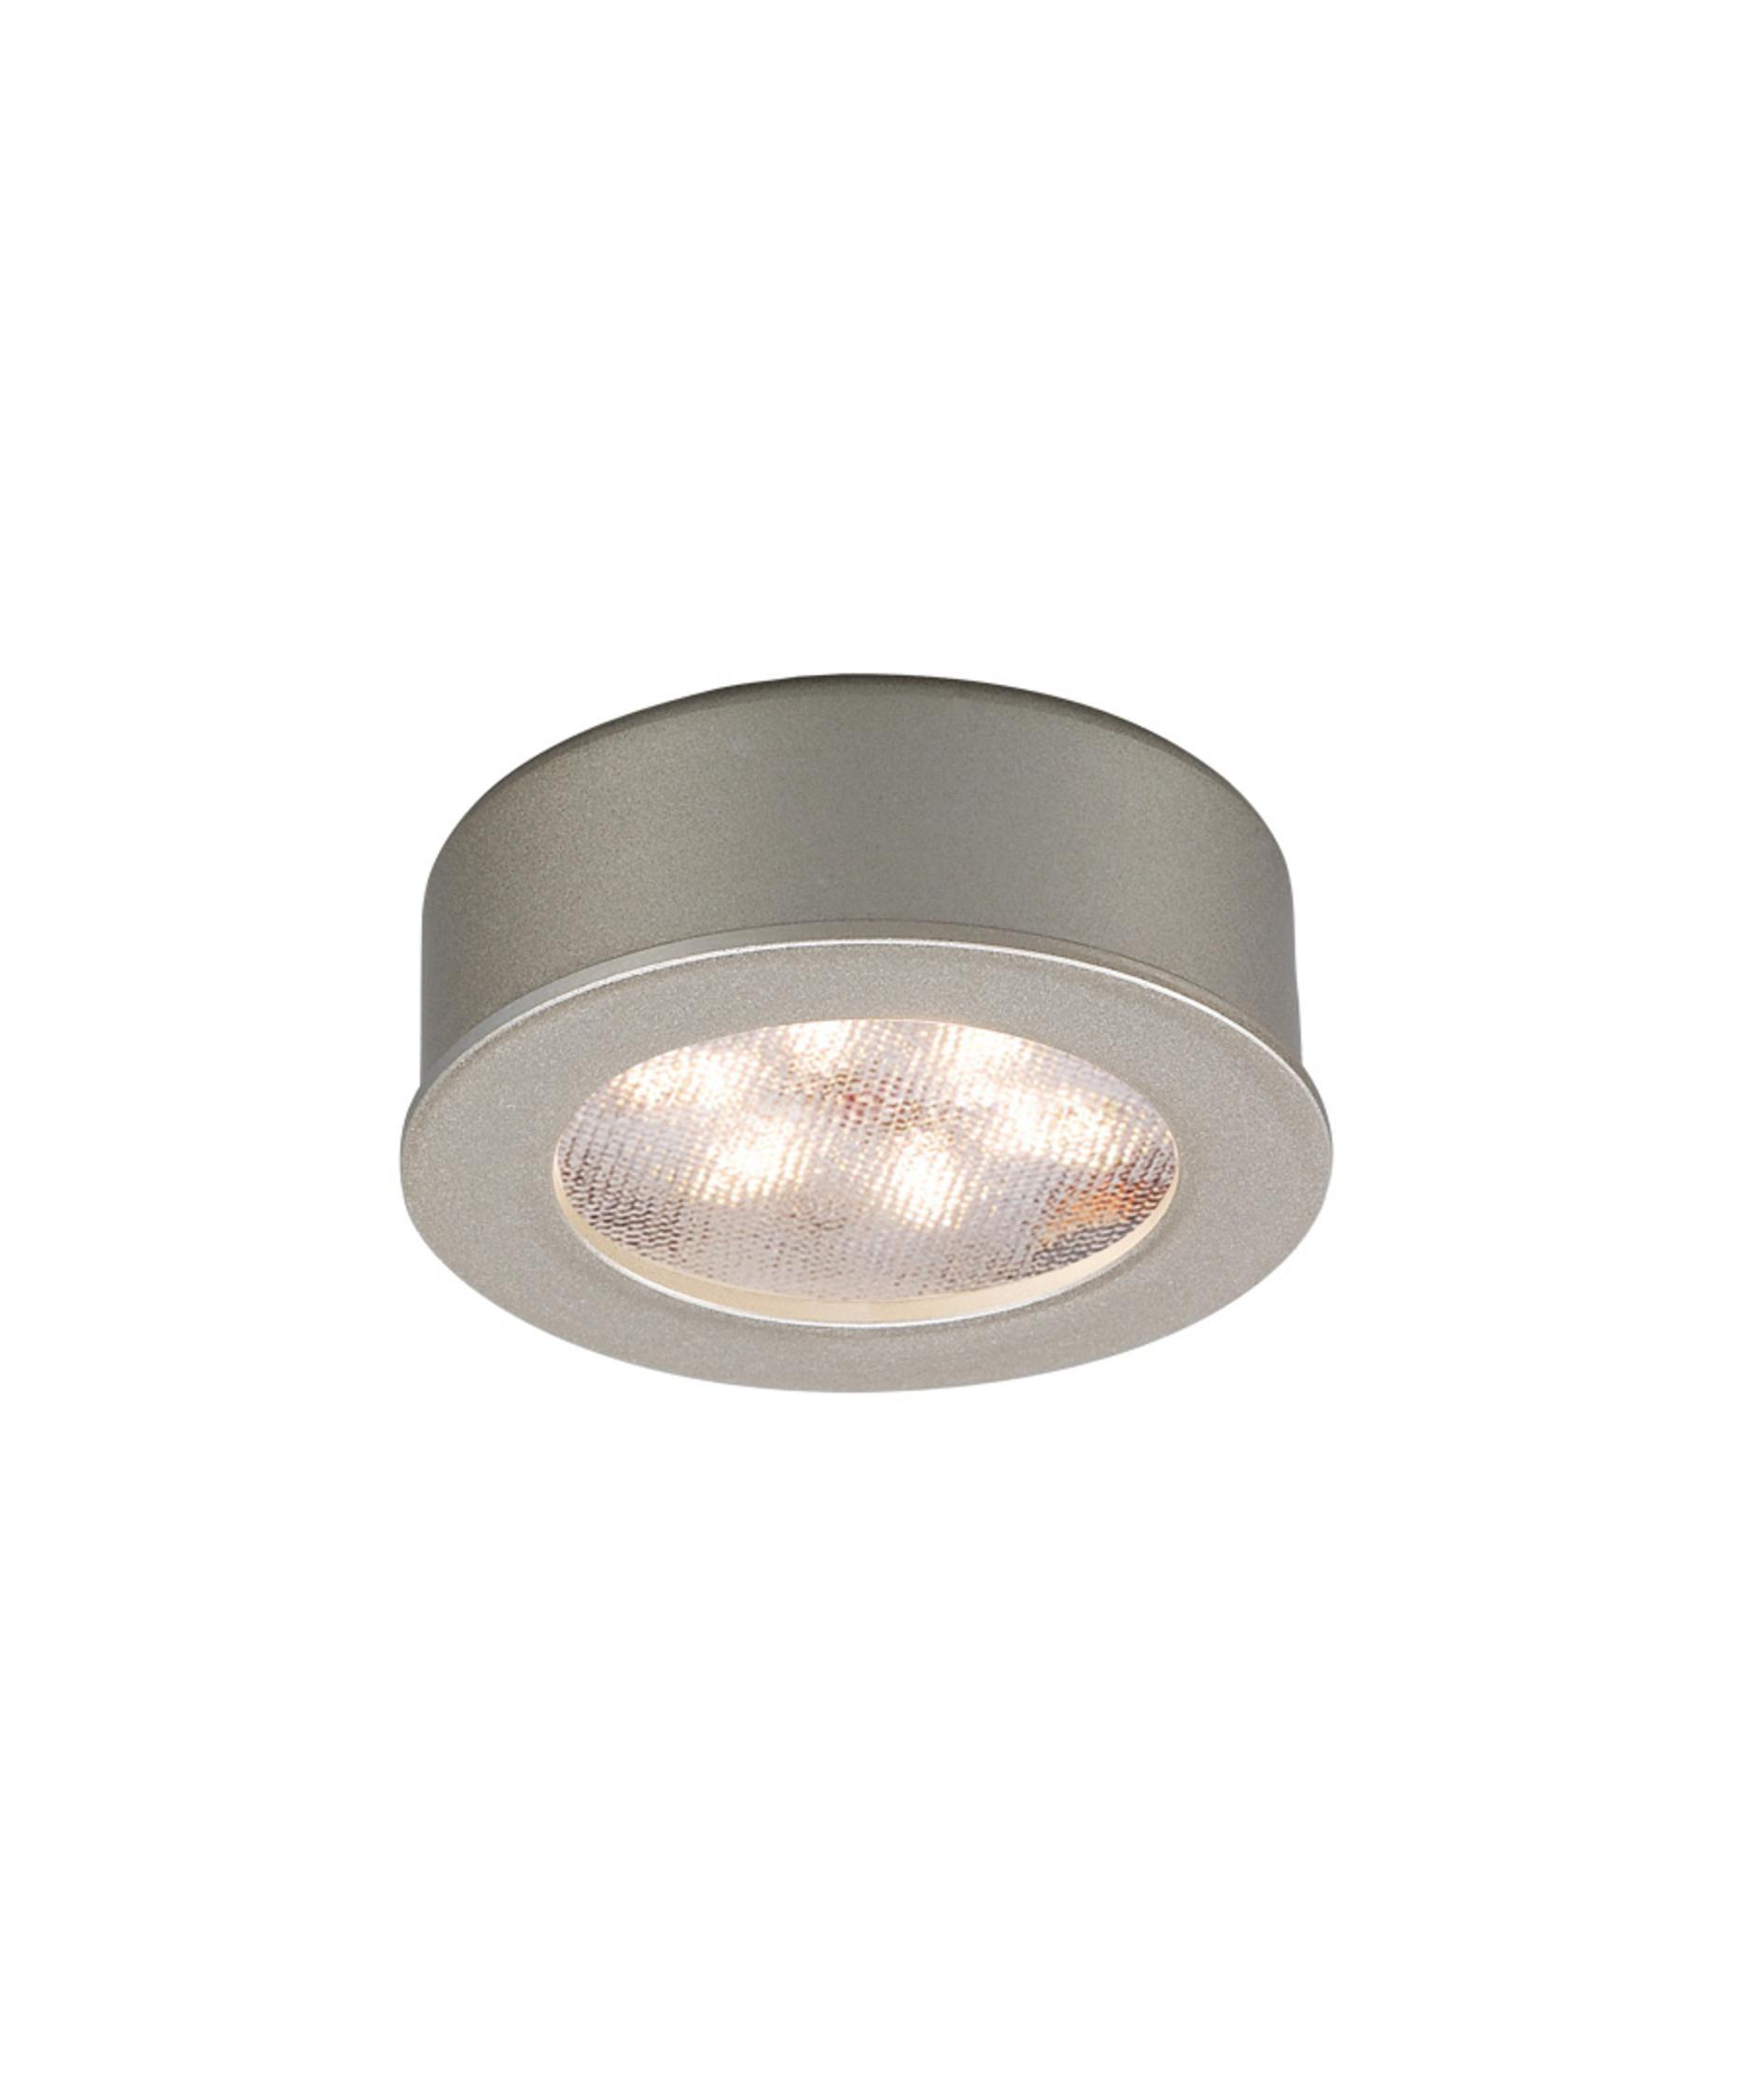 Wac lighting led - Wac Lighting 2 Inch 1 Light Light Bar Capitol Lighting 1 800lighting Com